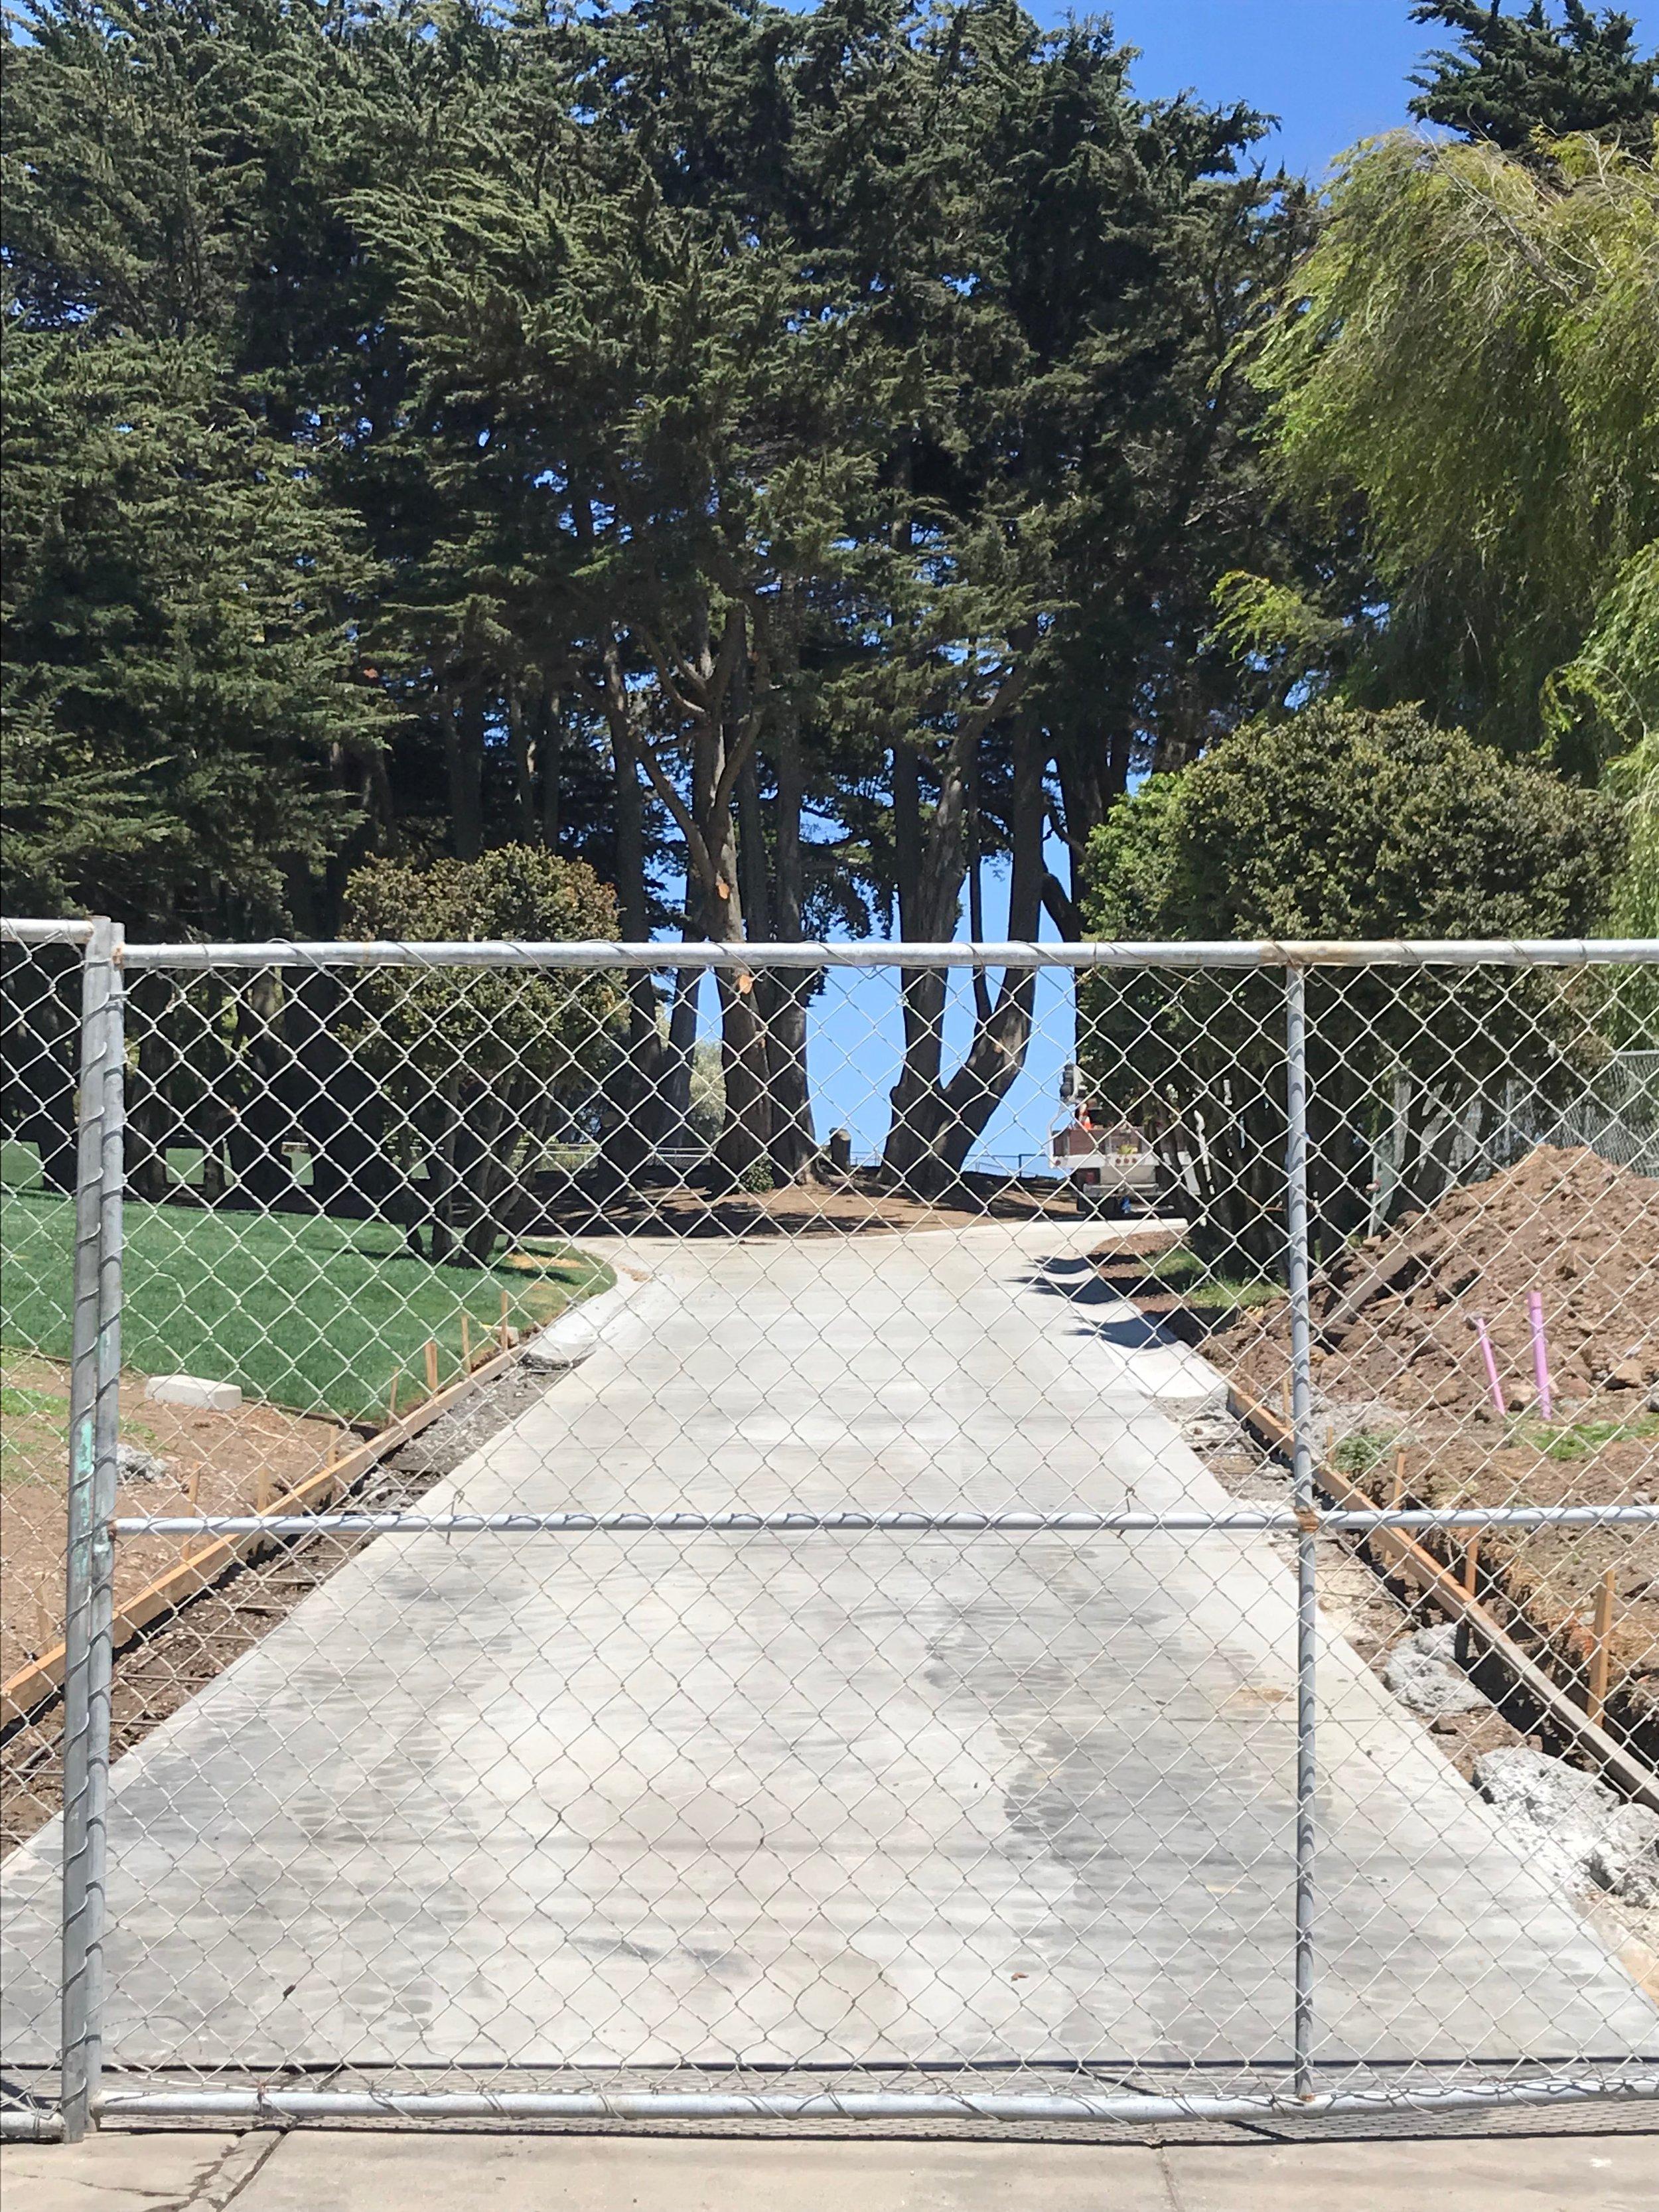 Renovated pathway at Washington & Scott under construction